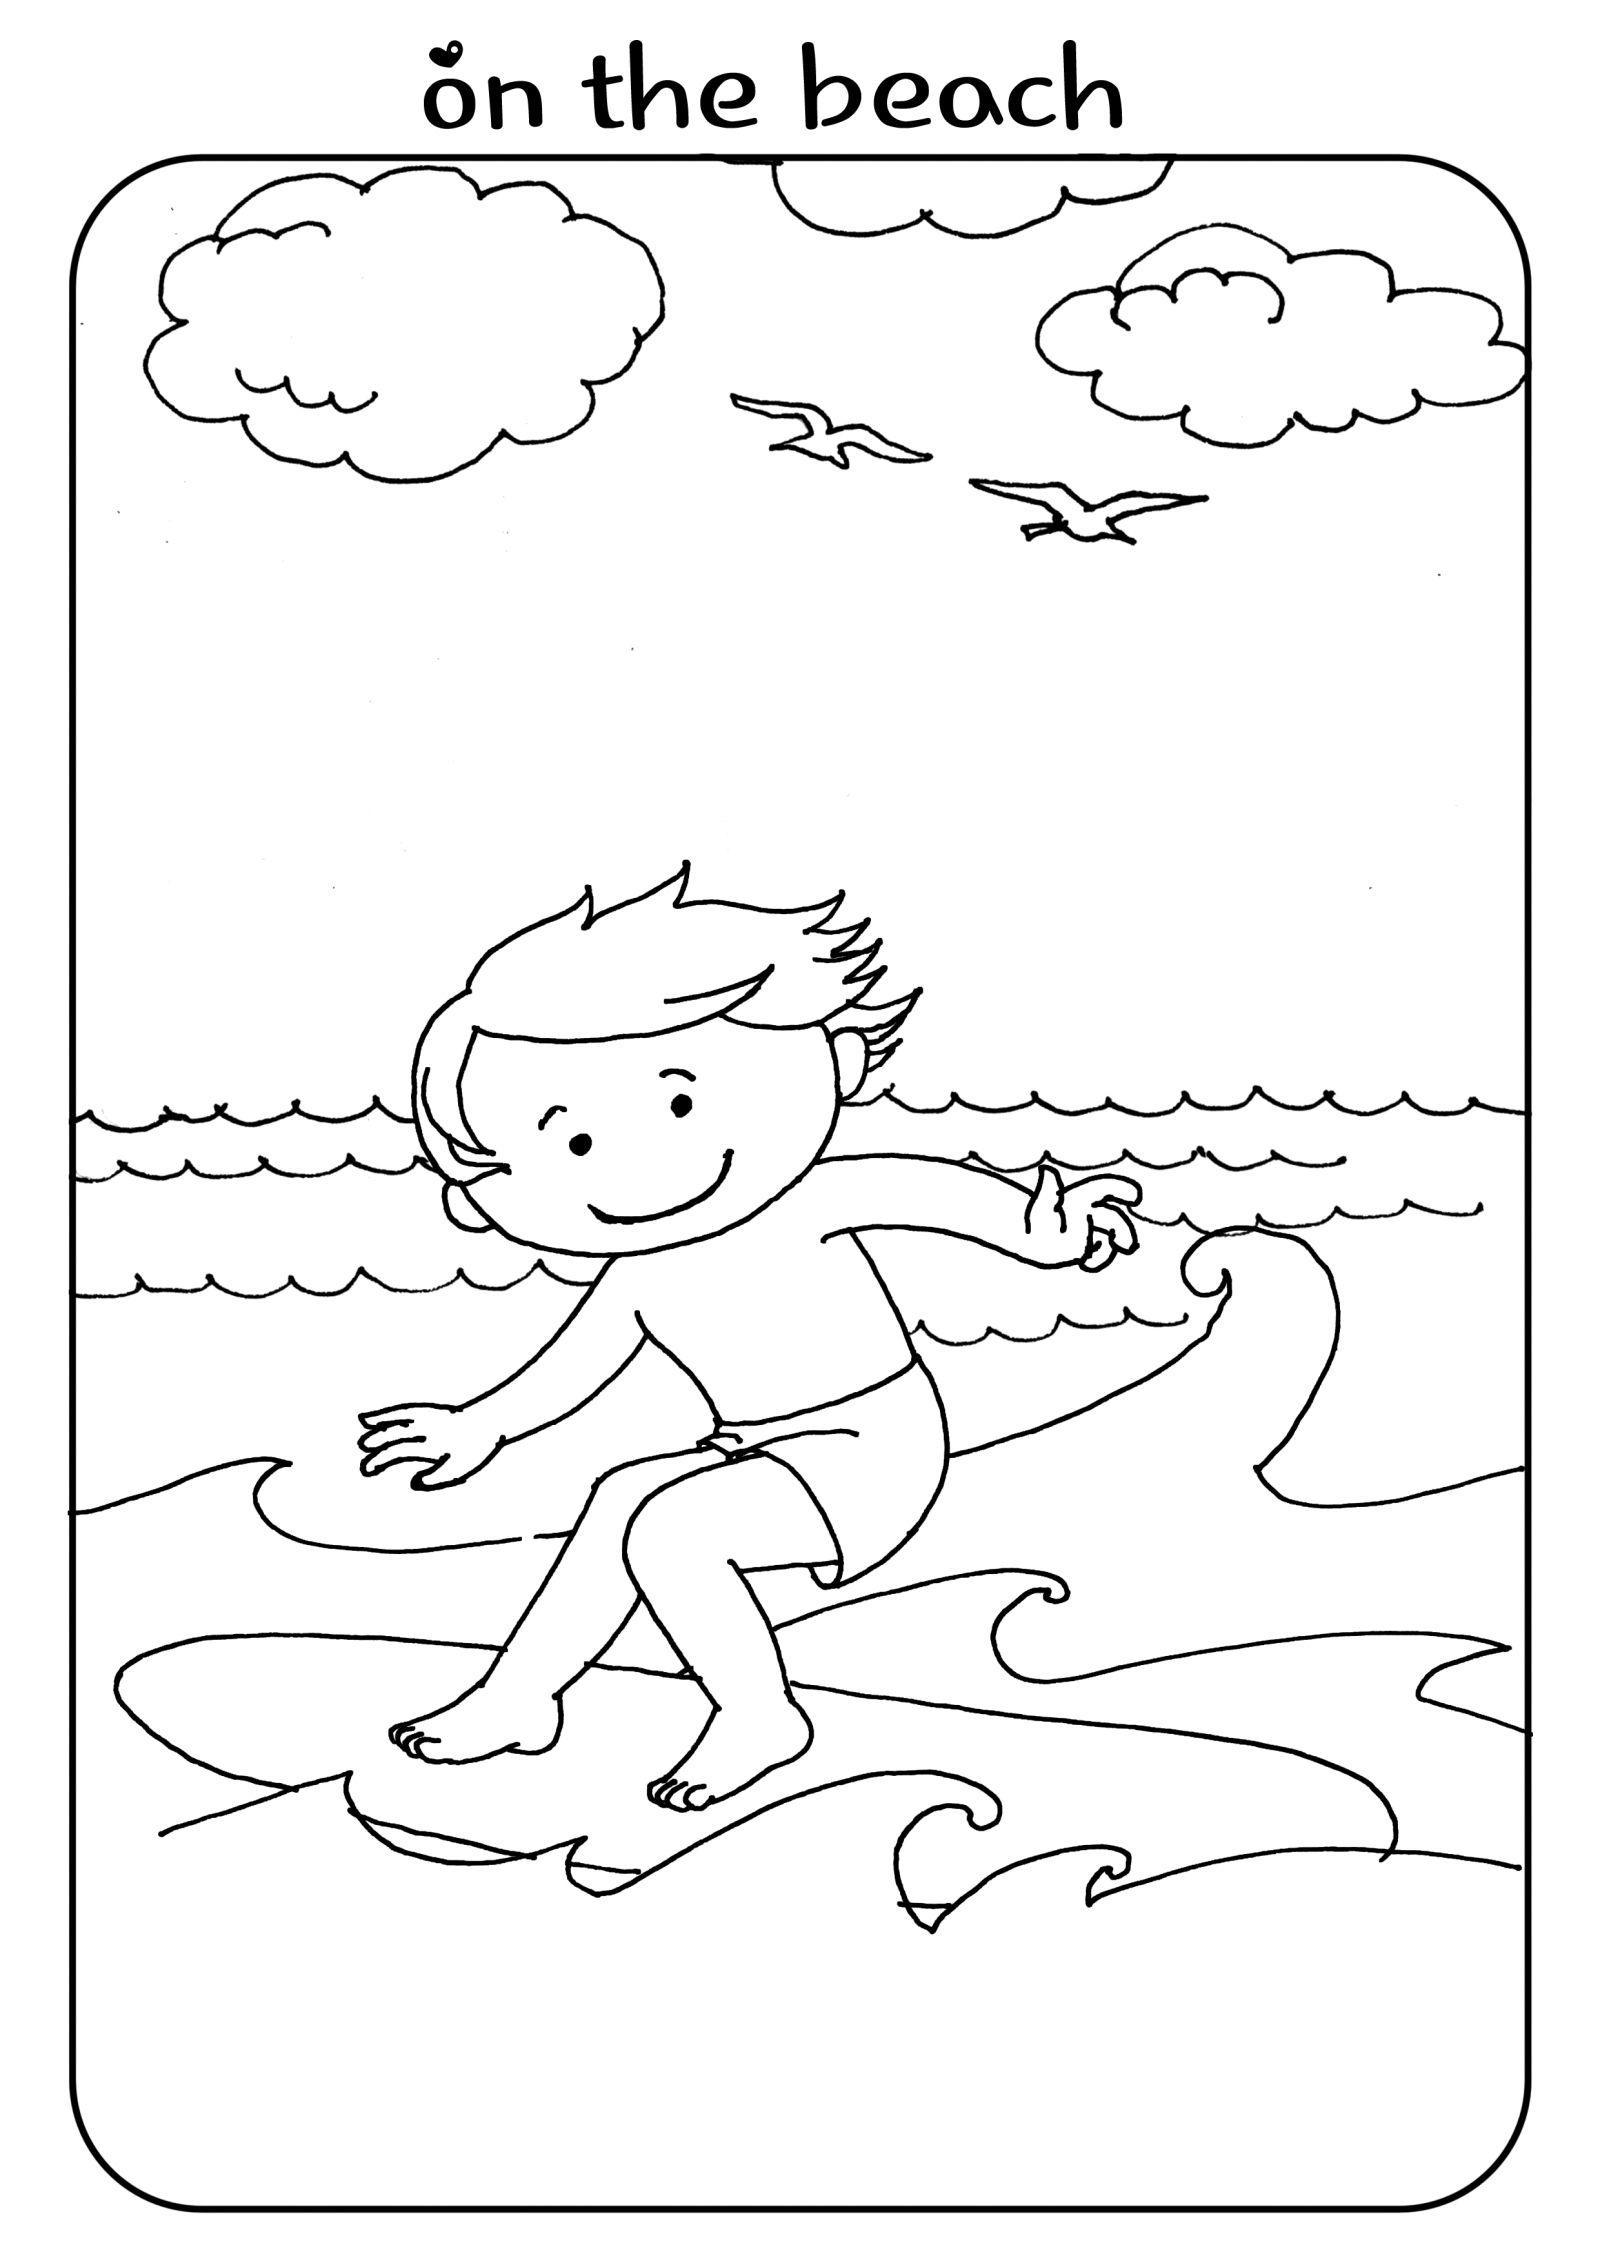 Beach Coloring Page Kids Activity Surfing Boy Trang Tri [ 2263 x 1600 Pixel ]